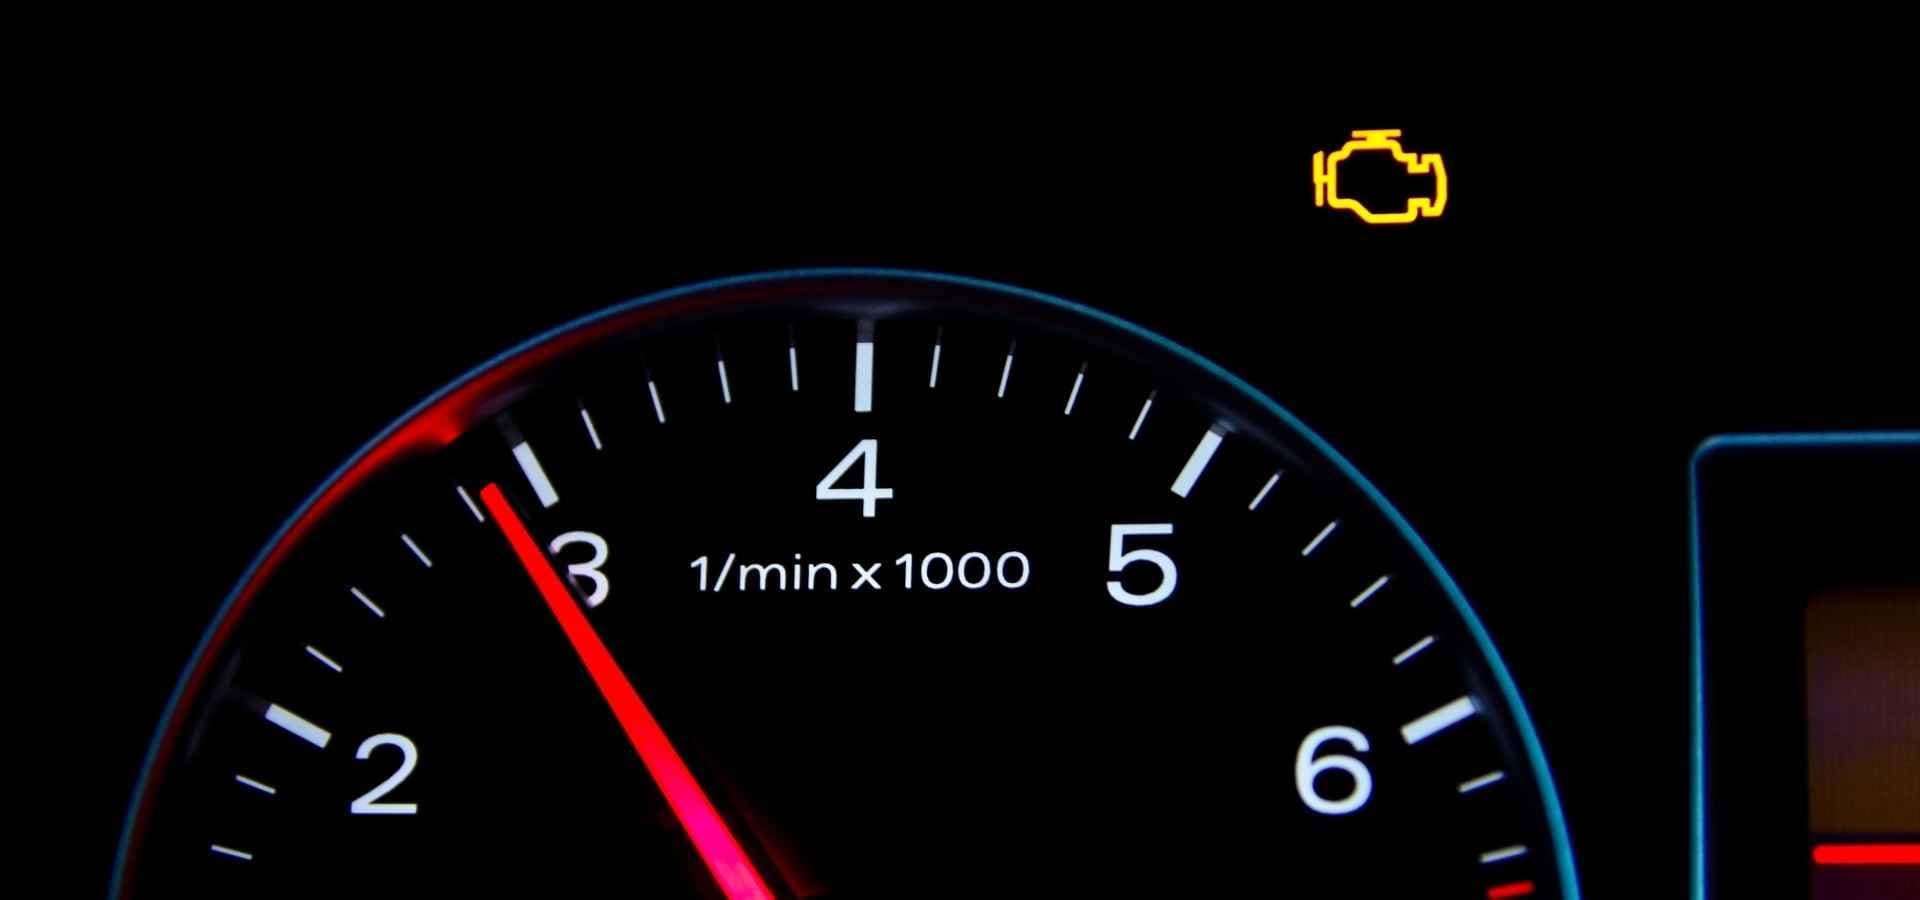 Mazda Check Engine Light